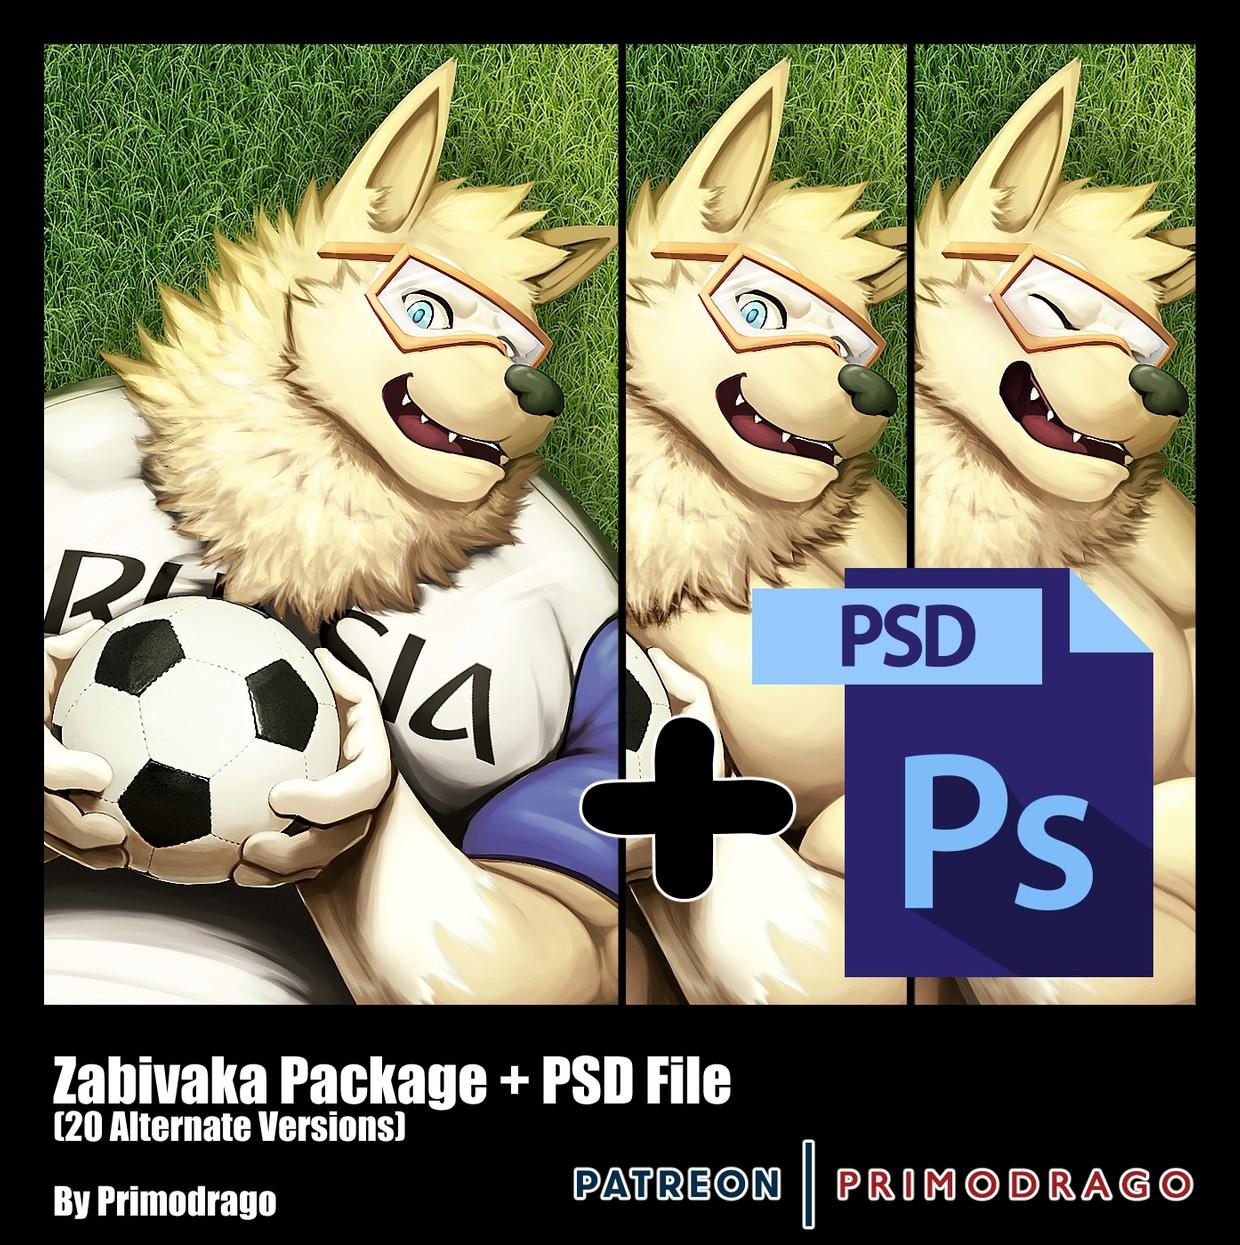 Zabivaka Artpack + PSD File